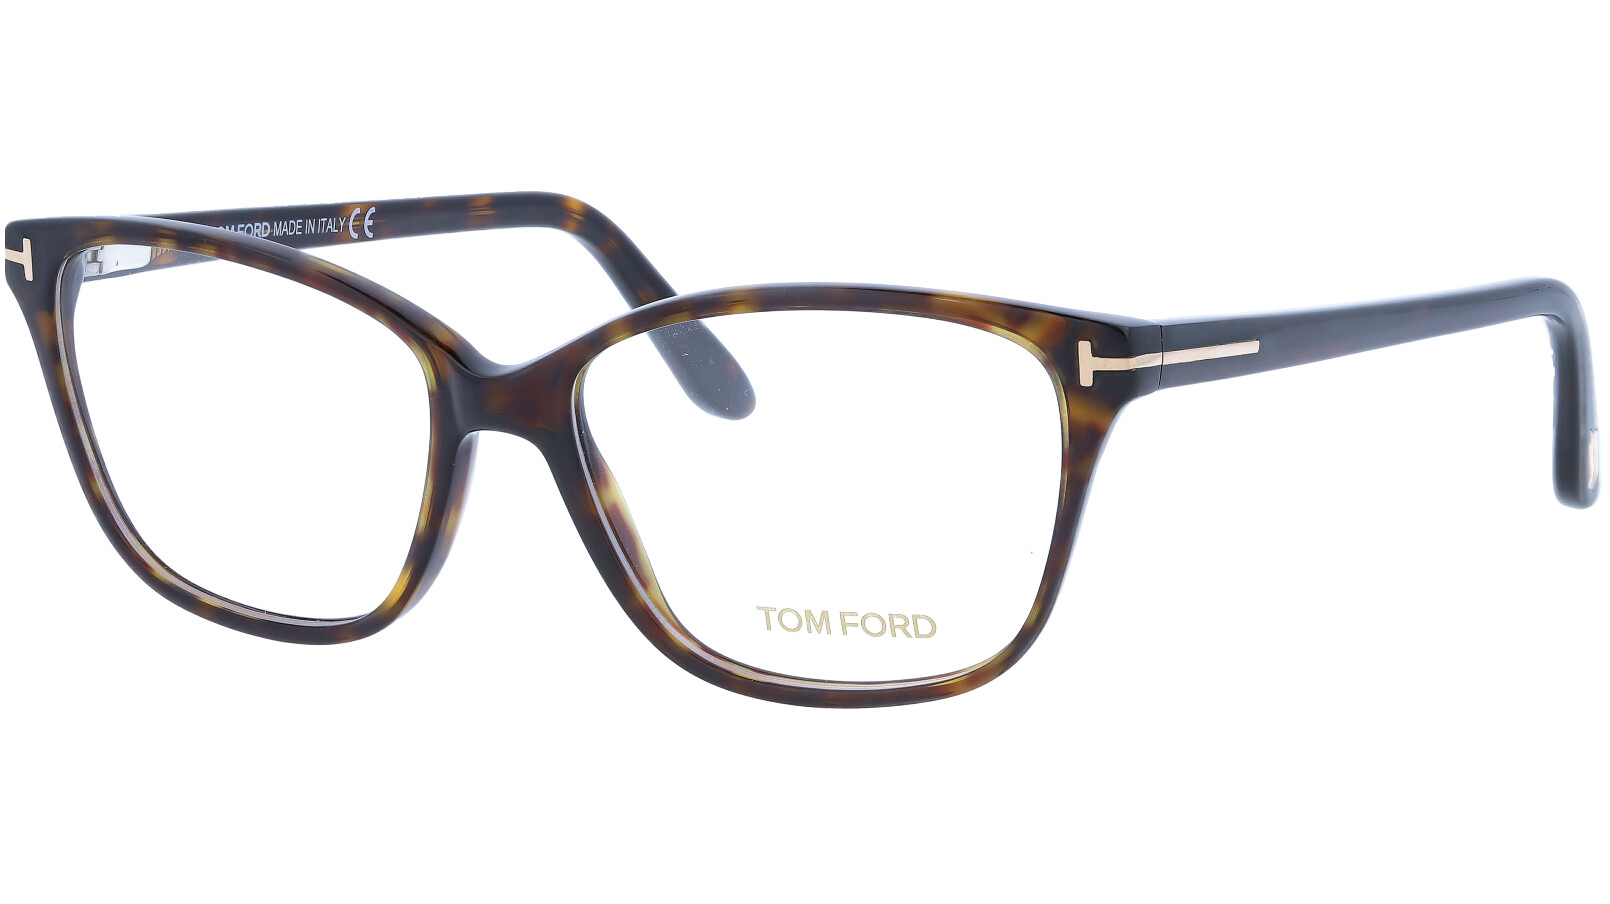 Tom Ford TF5293 052 54  Dark Glasses